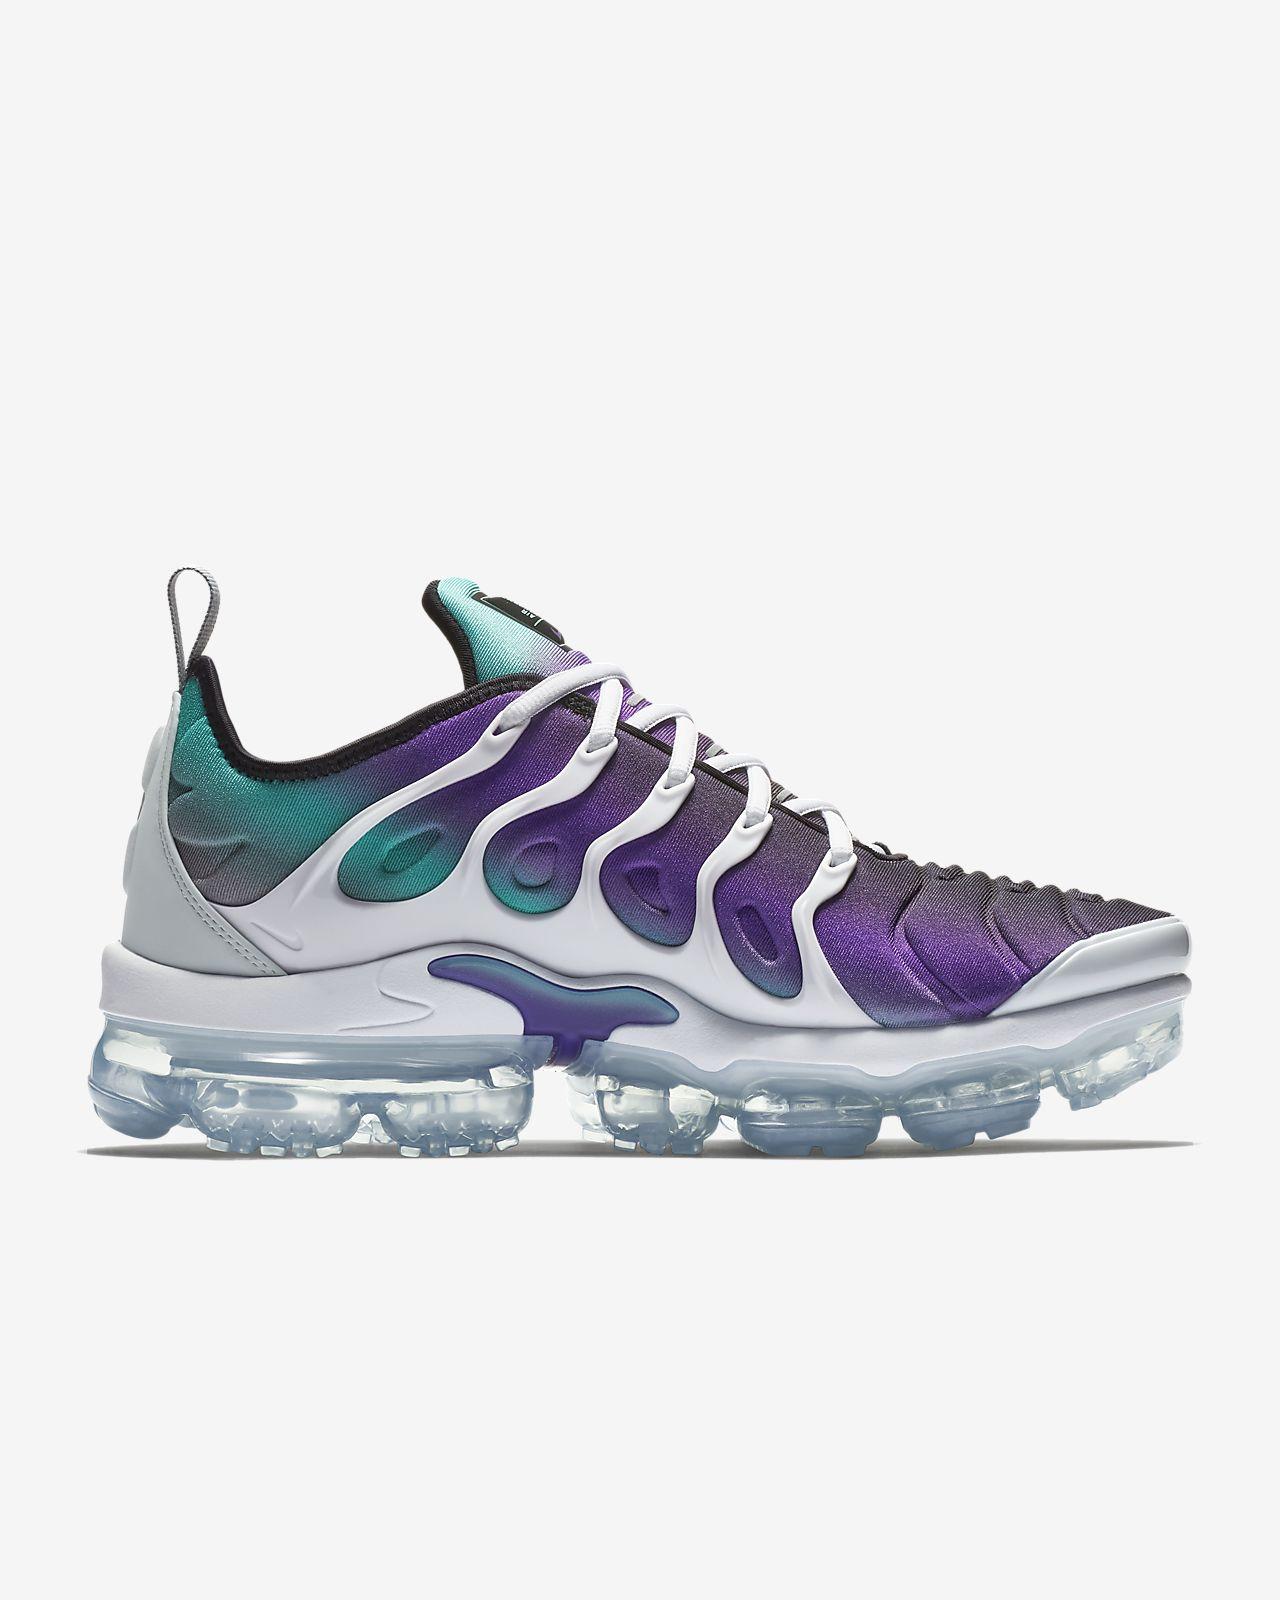 0b61ec9944ecd Nike Air Vapormax Plus TM Silver Men s Running Shoes